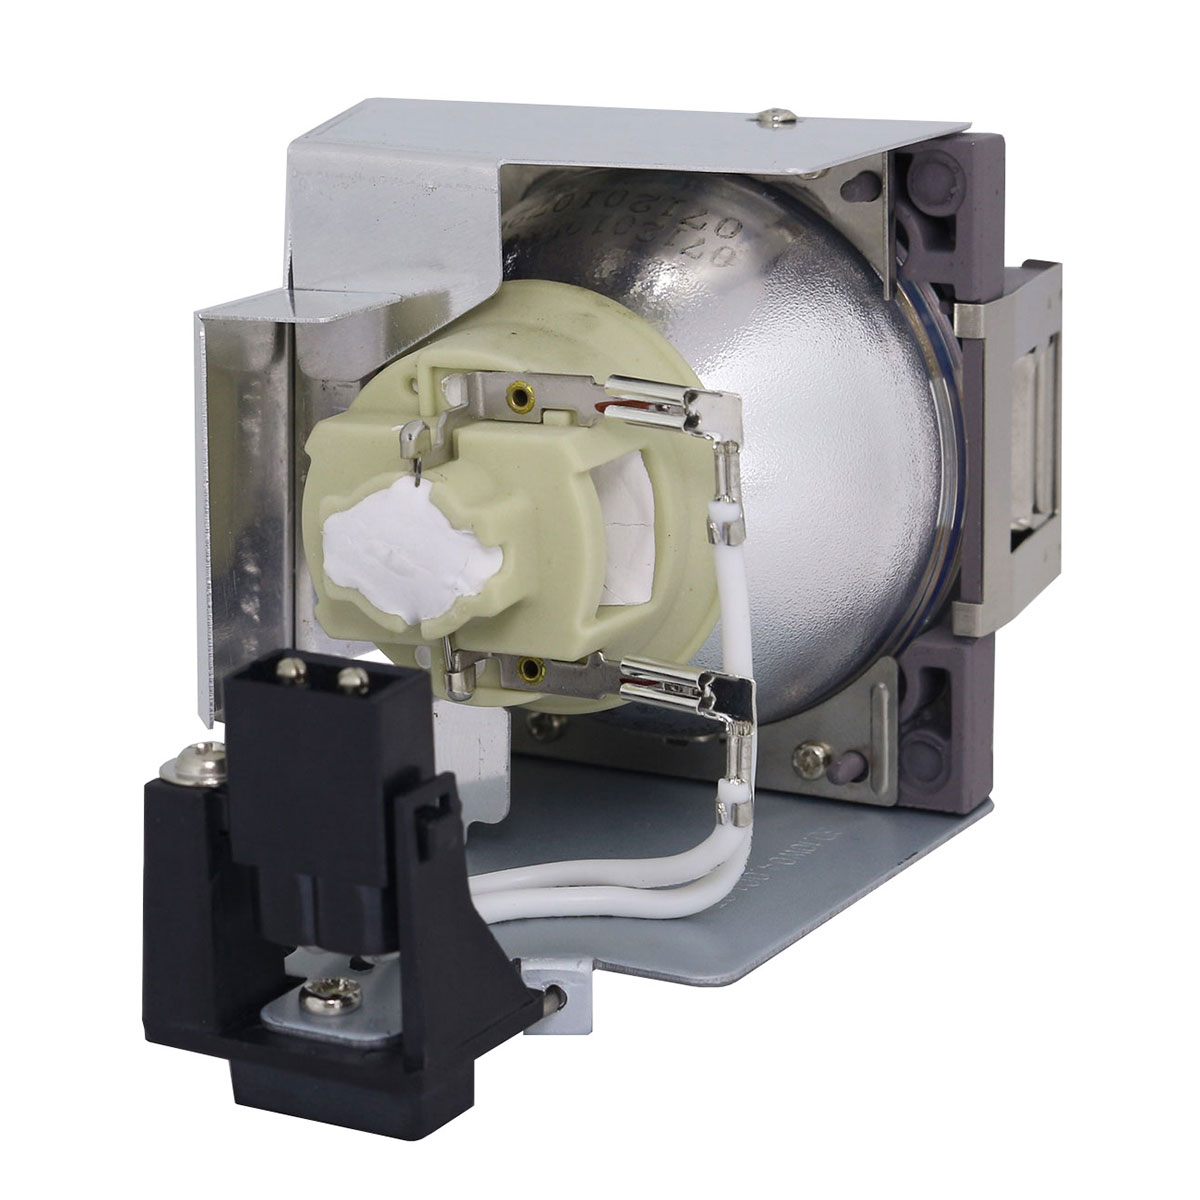 Original Philips Projector Replacement Lamp for BenQ 5J.J7L05.001